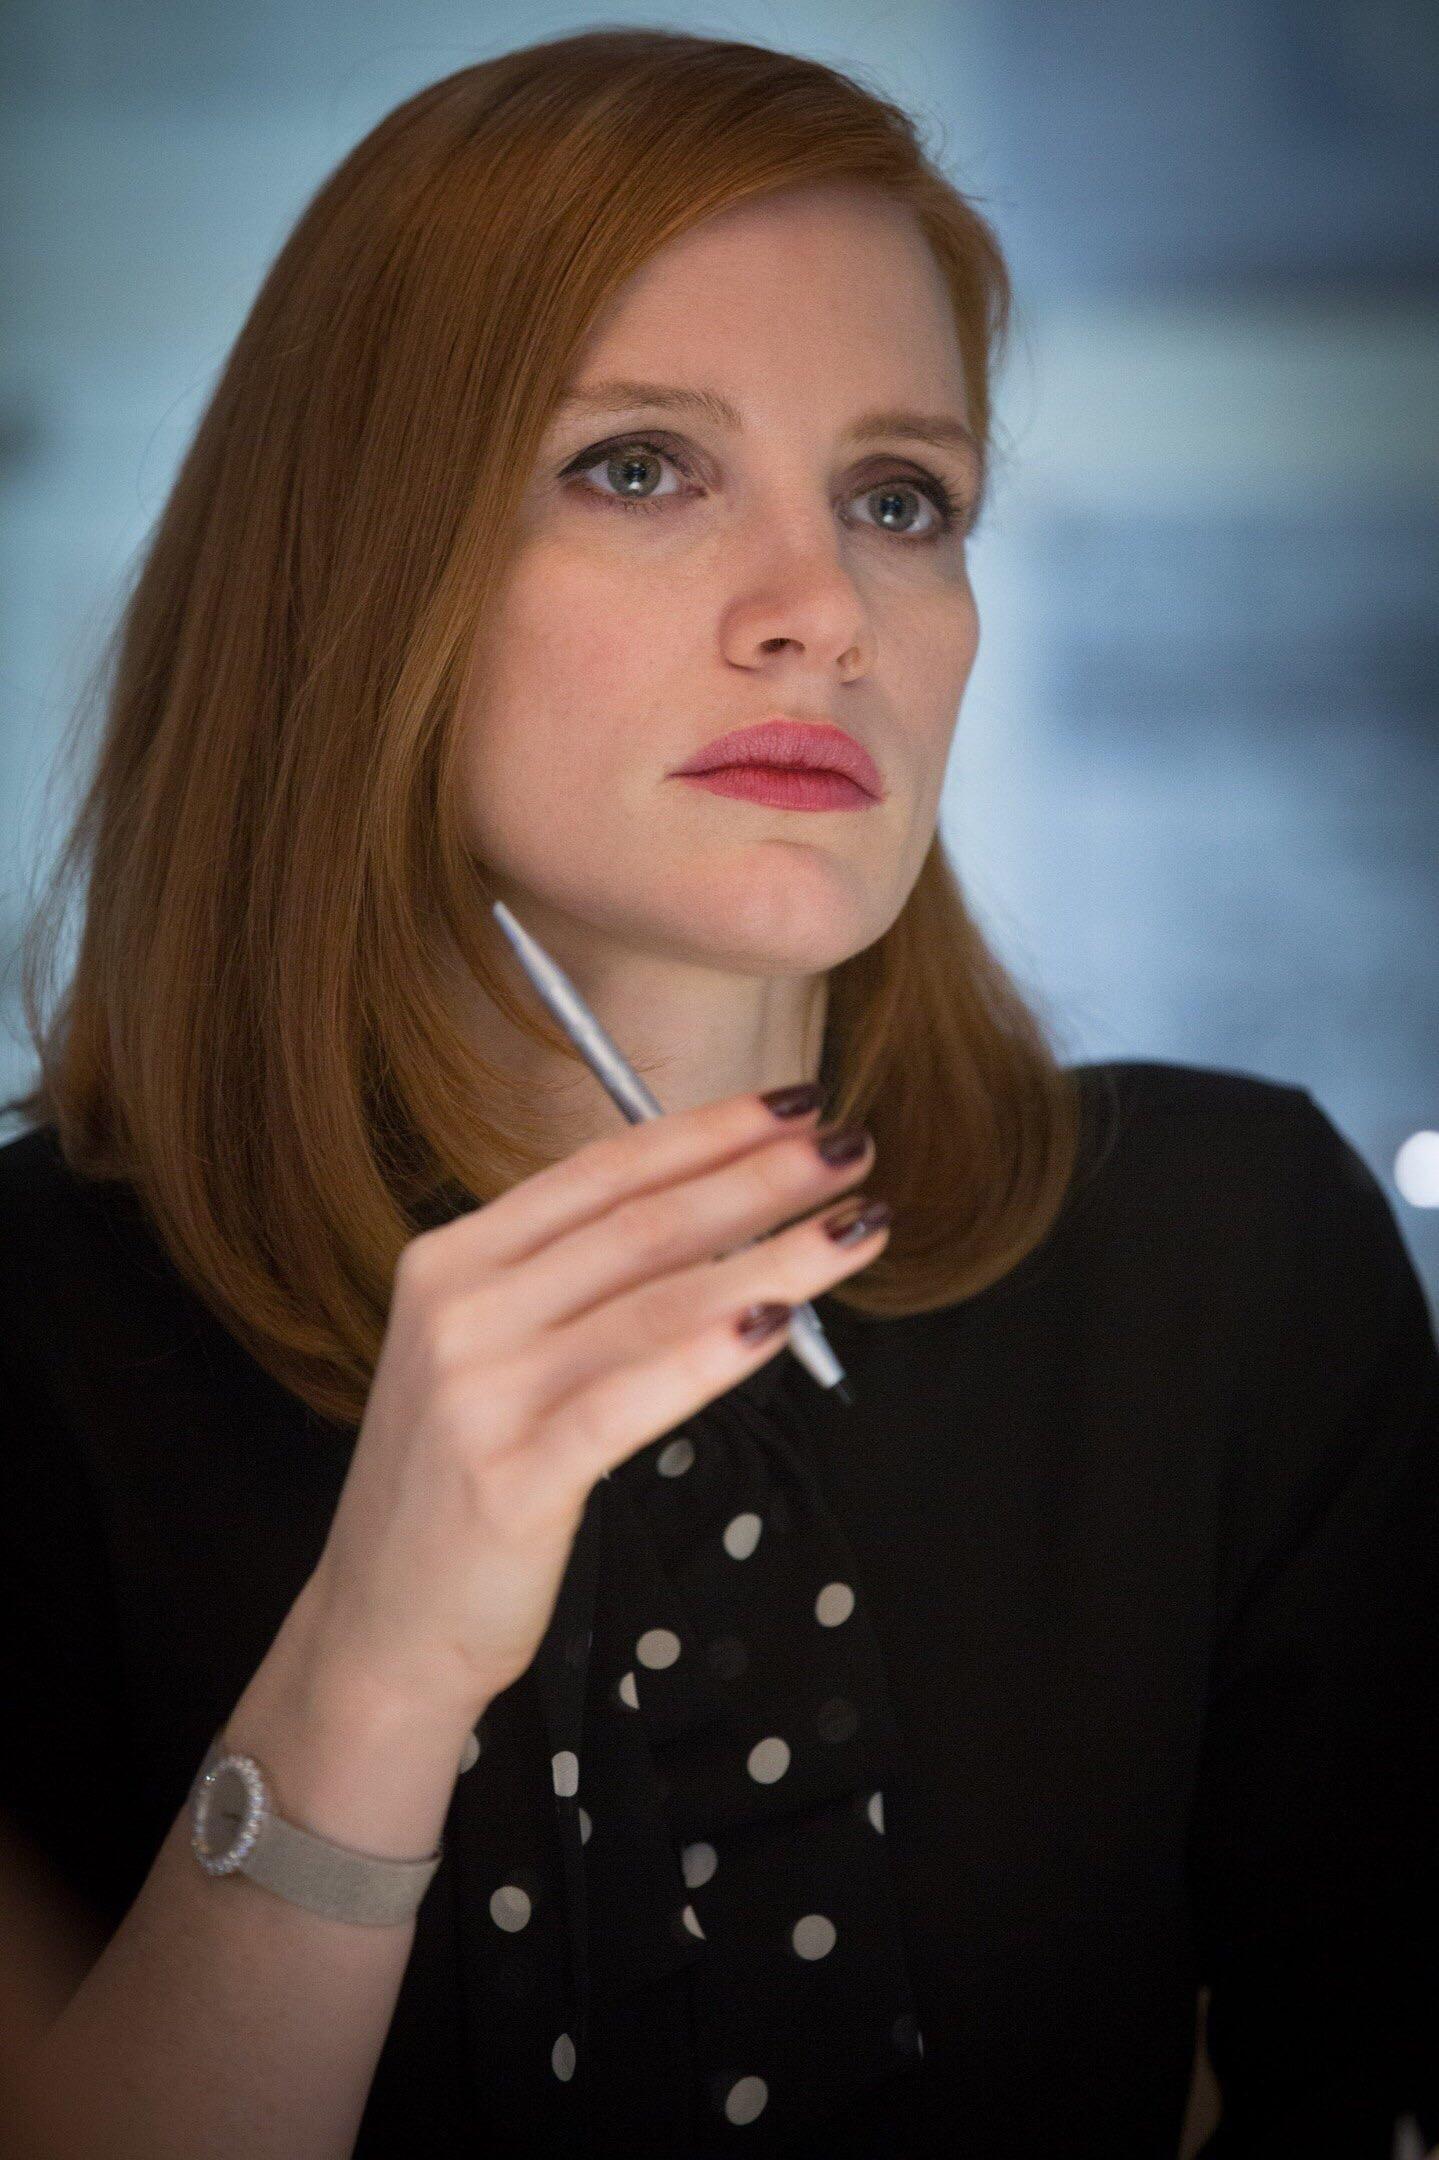 Jessica chastain as professor melinda tate in 2020